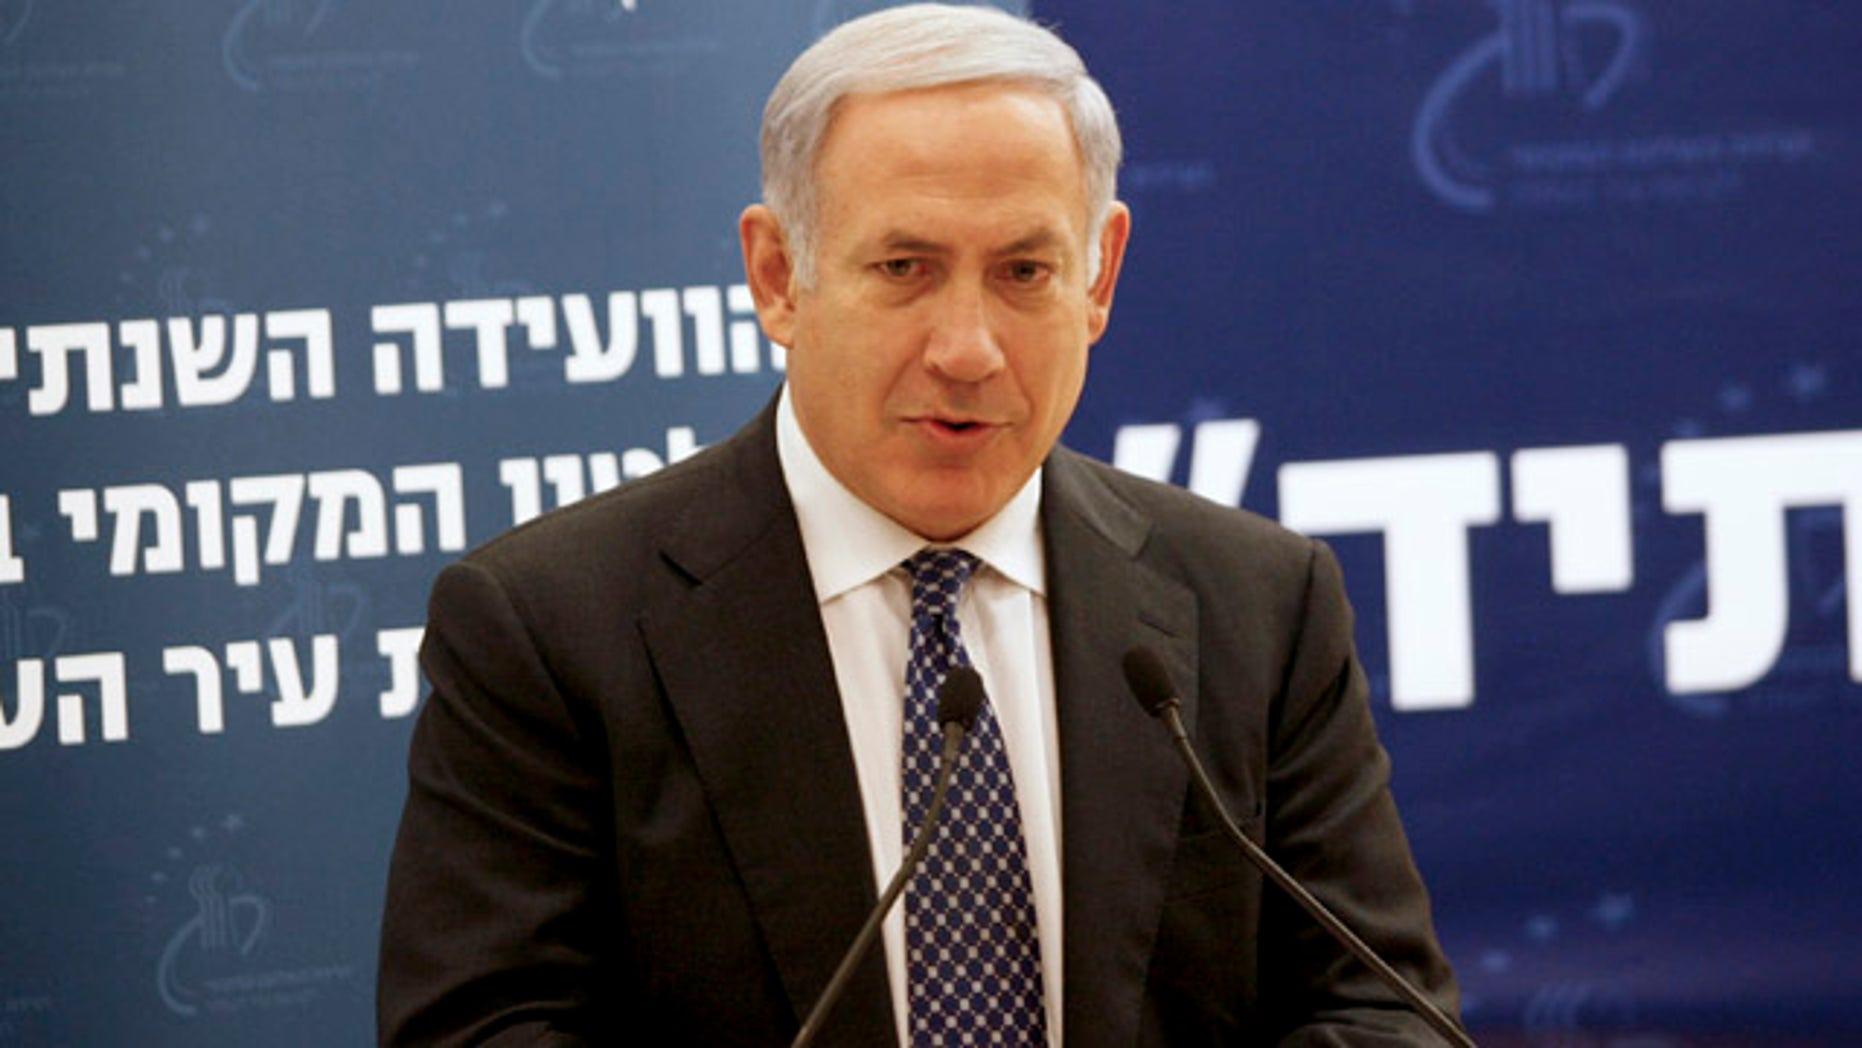 Dec. 8: Israeli Prime Minister Benjamin Netanyahu talks during a meeting of local council heads in Herzliya, near Tel Aviv, Israel.